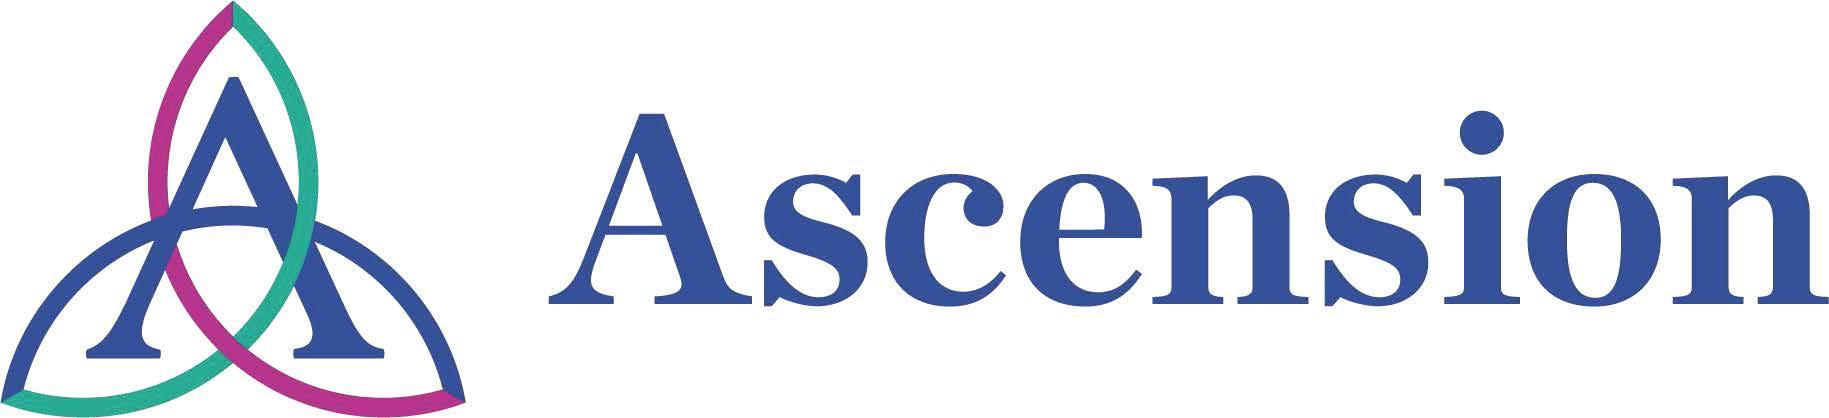 Ascension sponsor logo